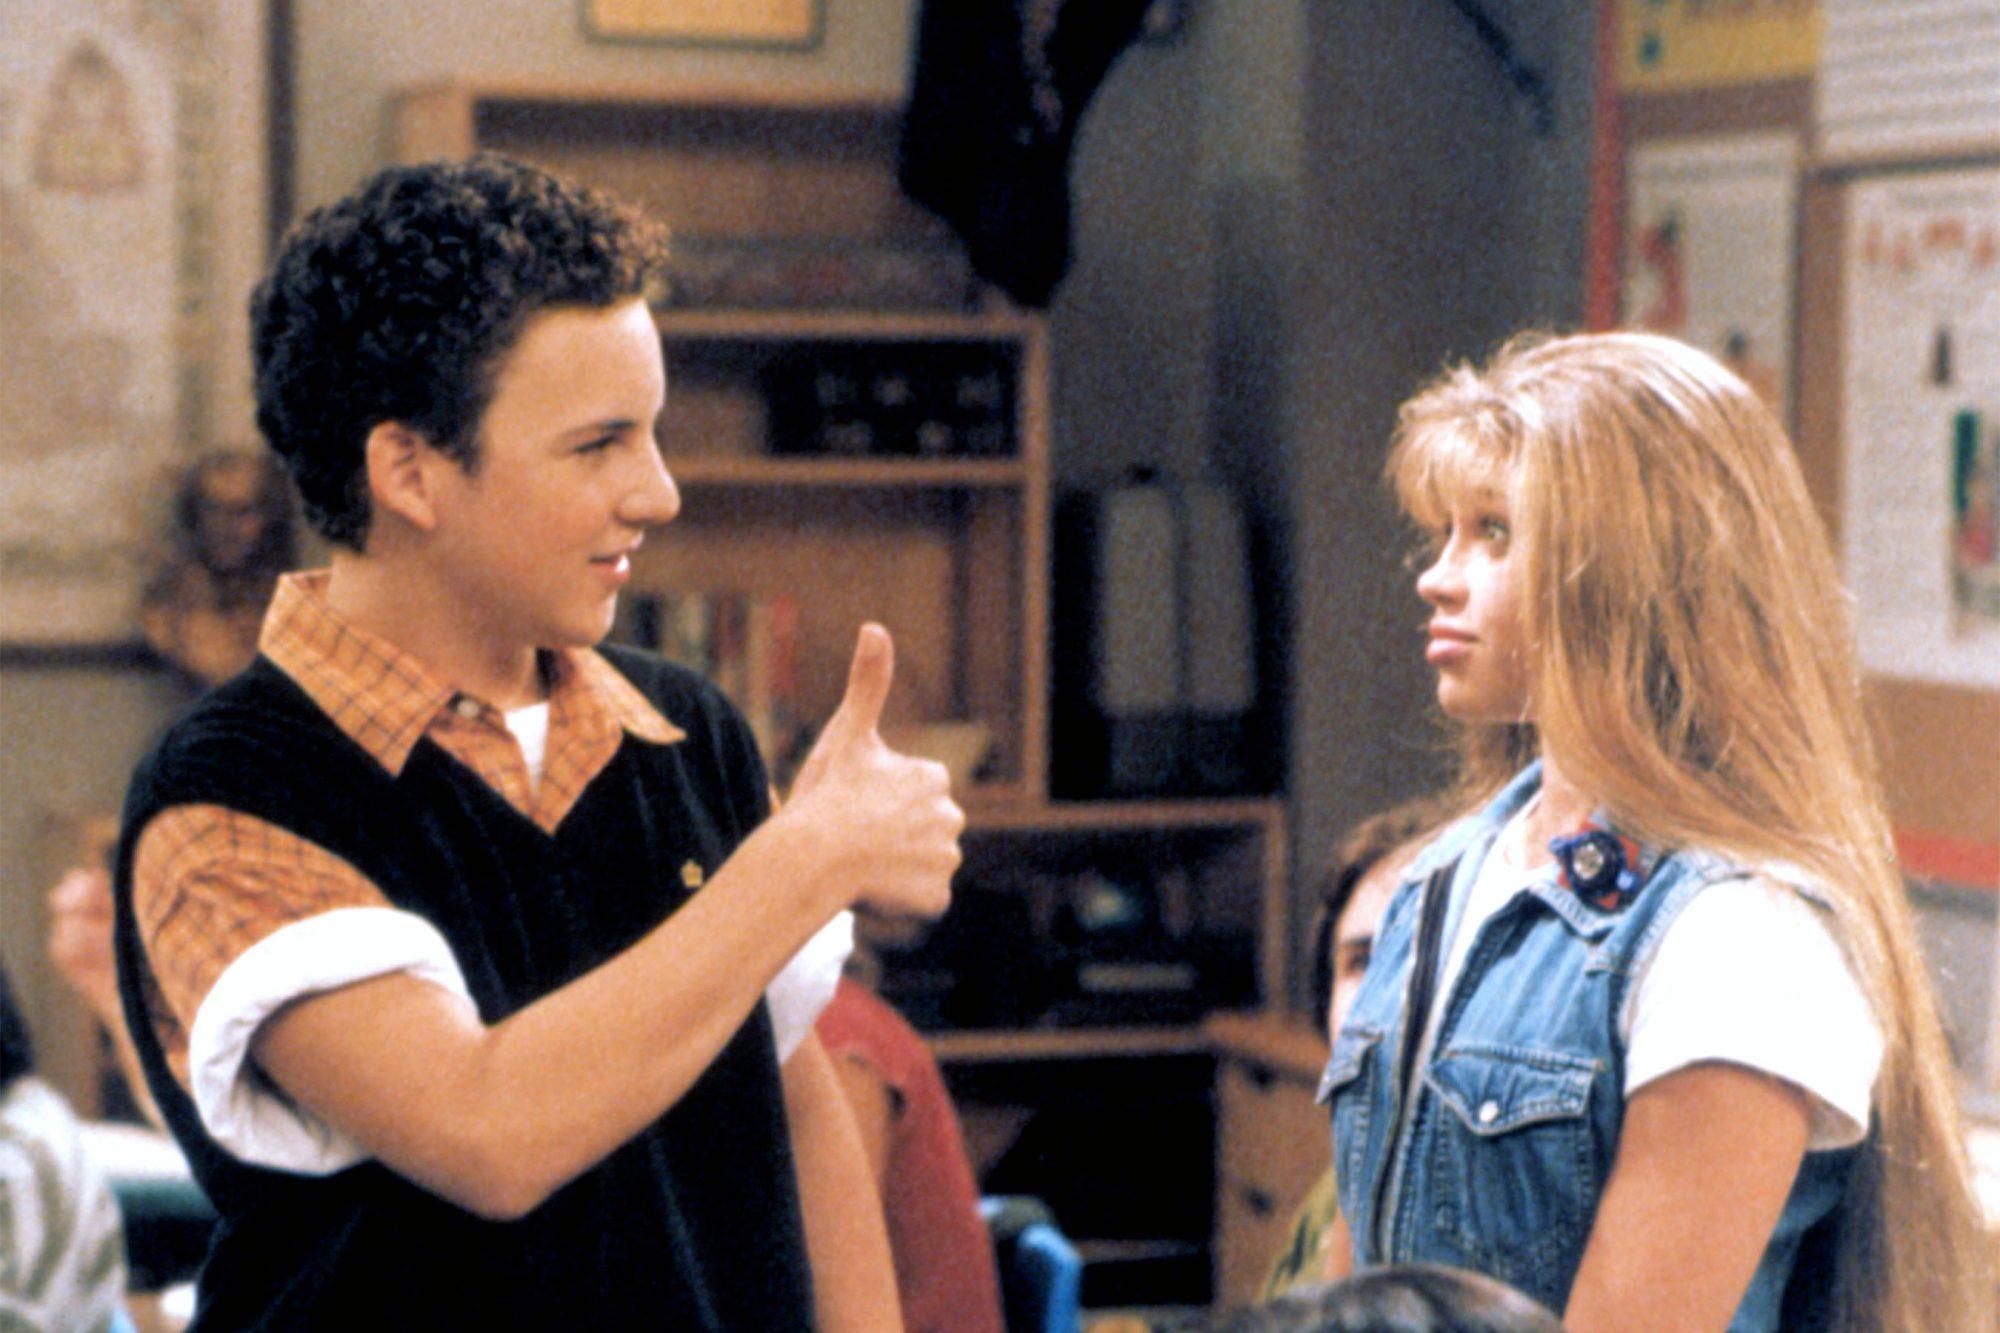 BOY MEETS WORLD, Ben Savage, Danielle Fishel, 1993-2000, (c)Touchstone Television/courtesy Everett C